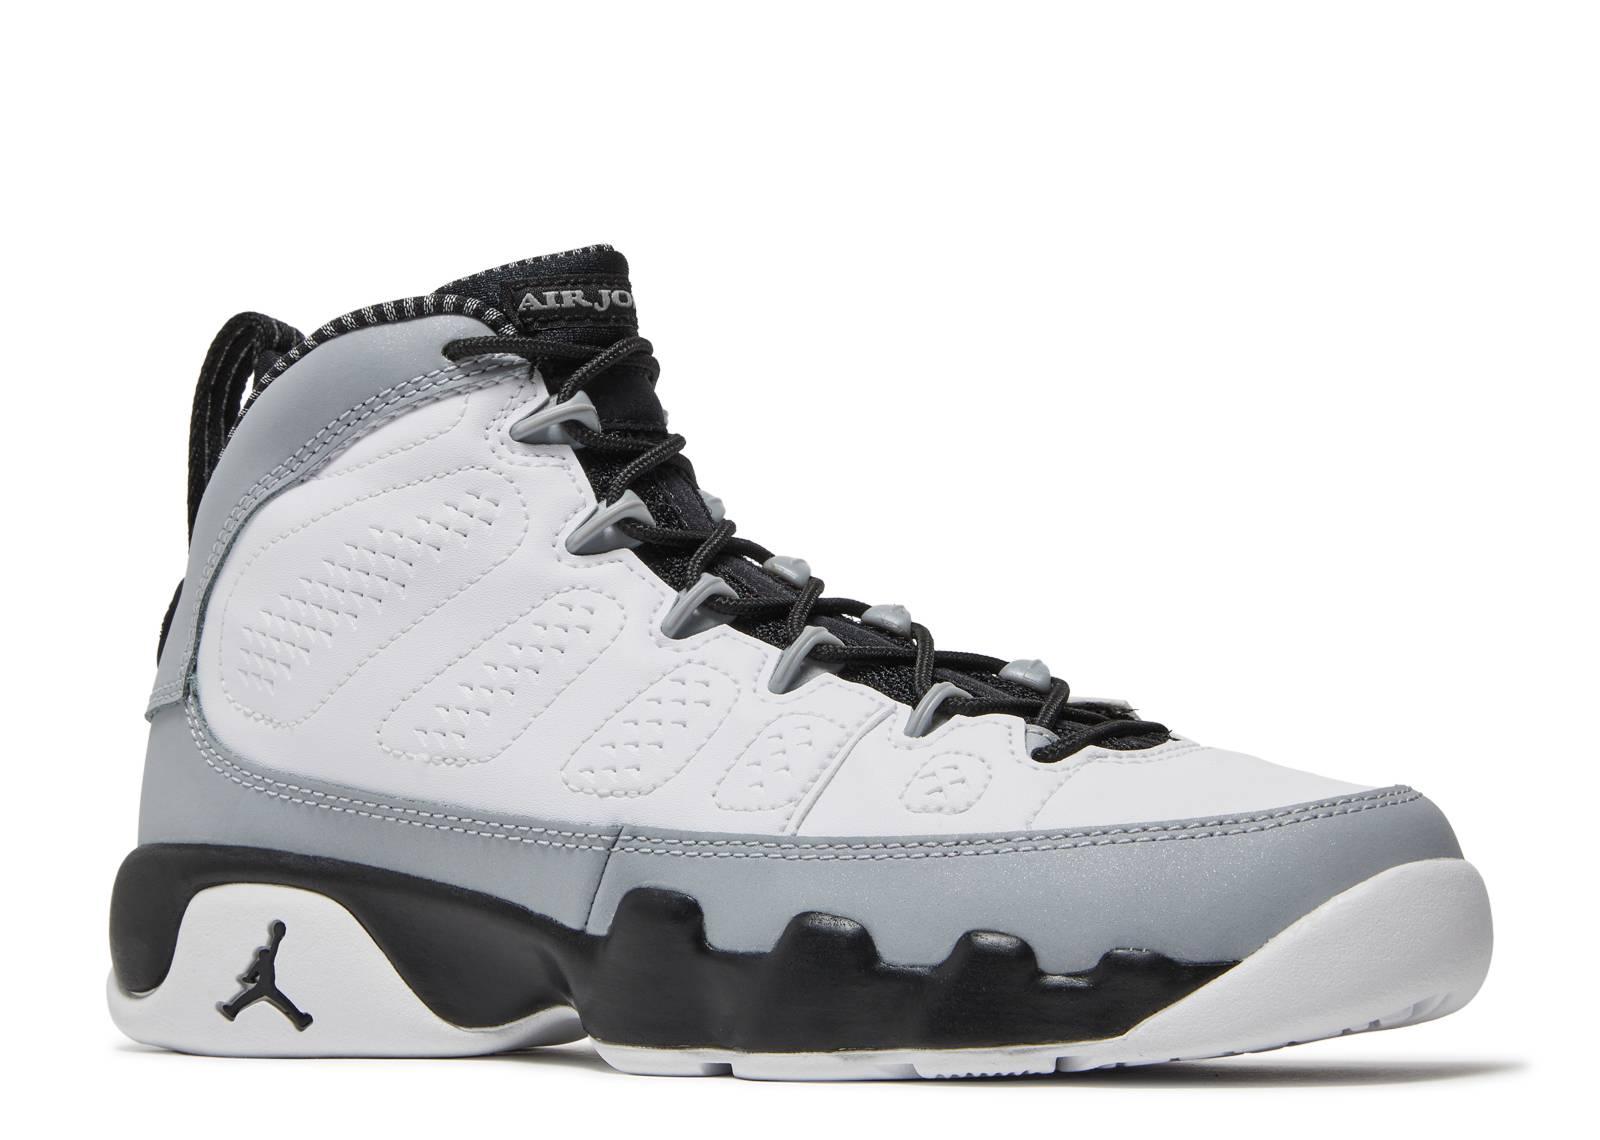 best sneakers 96a37 863dc jordan 10 barons on sale > OFF32% Discounts